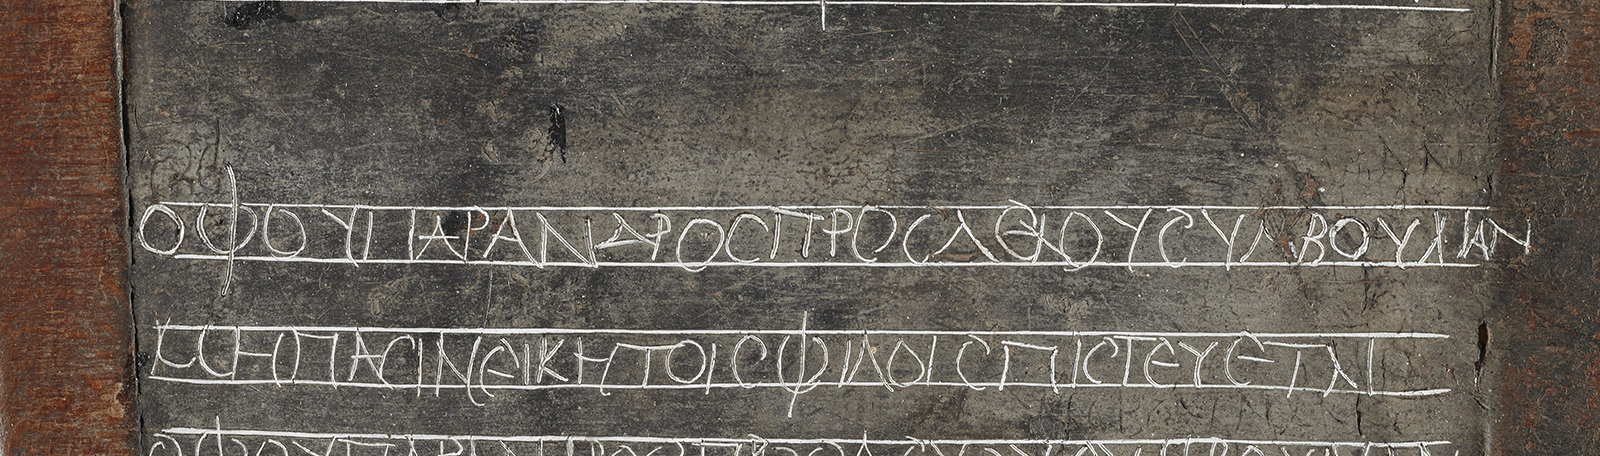 A 2,000-year-old homework book